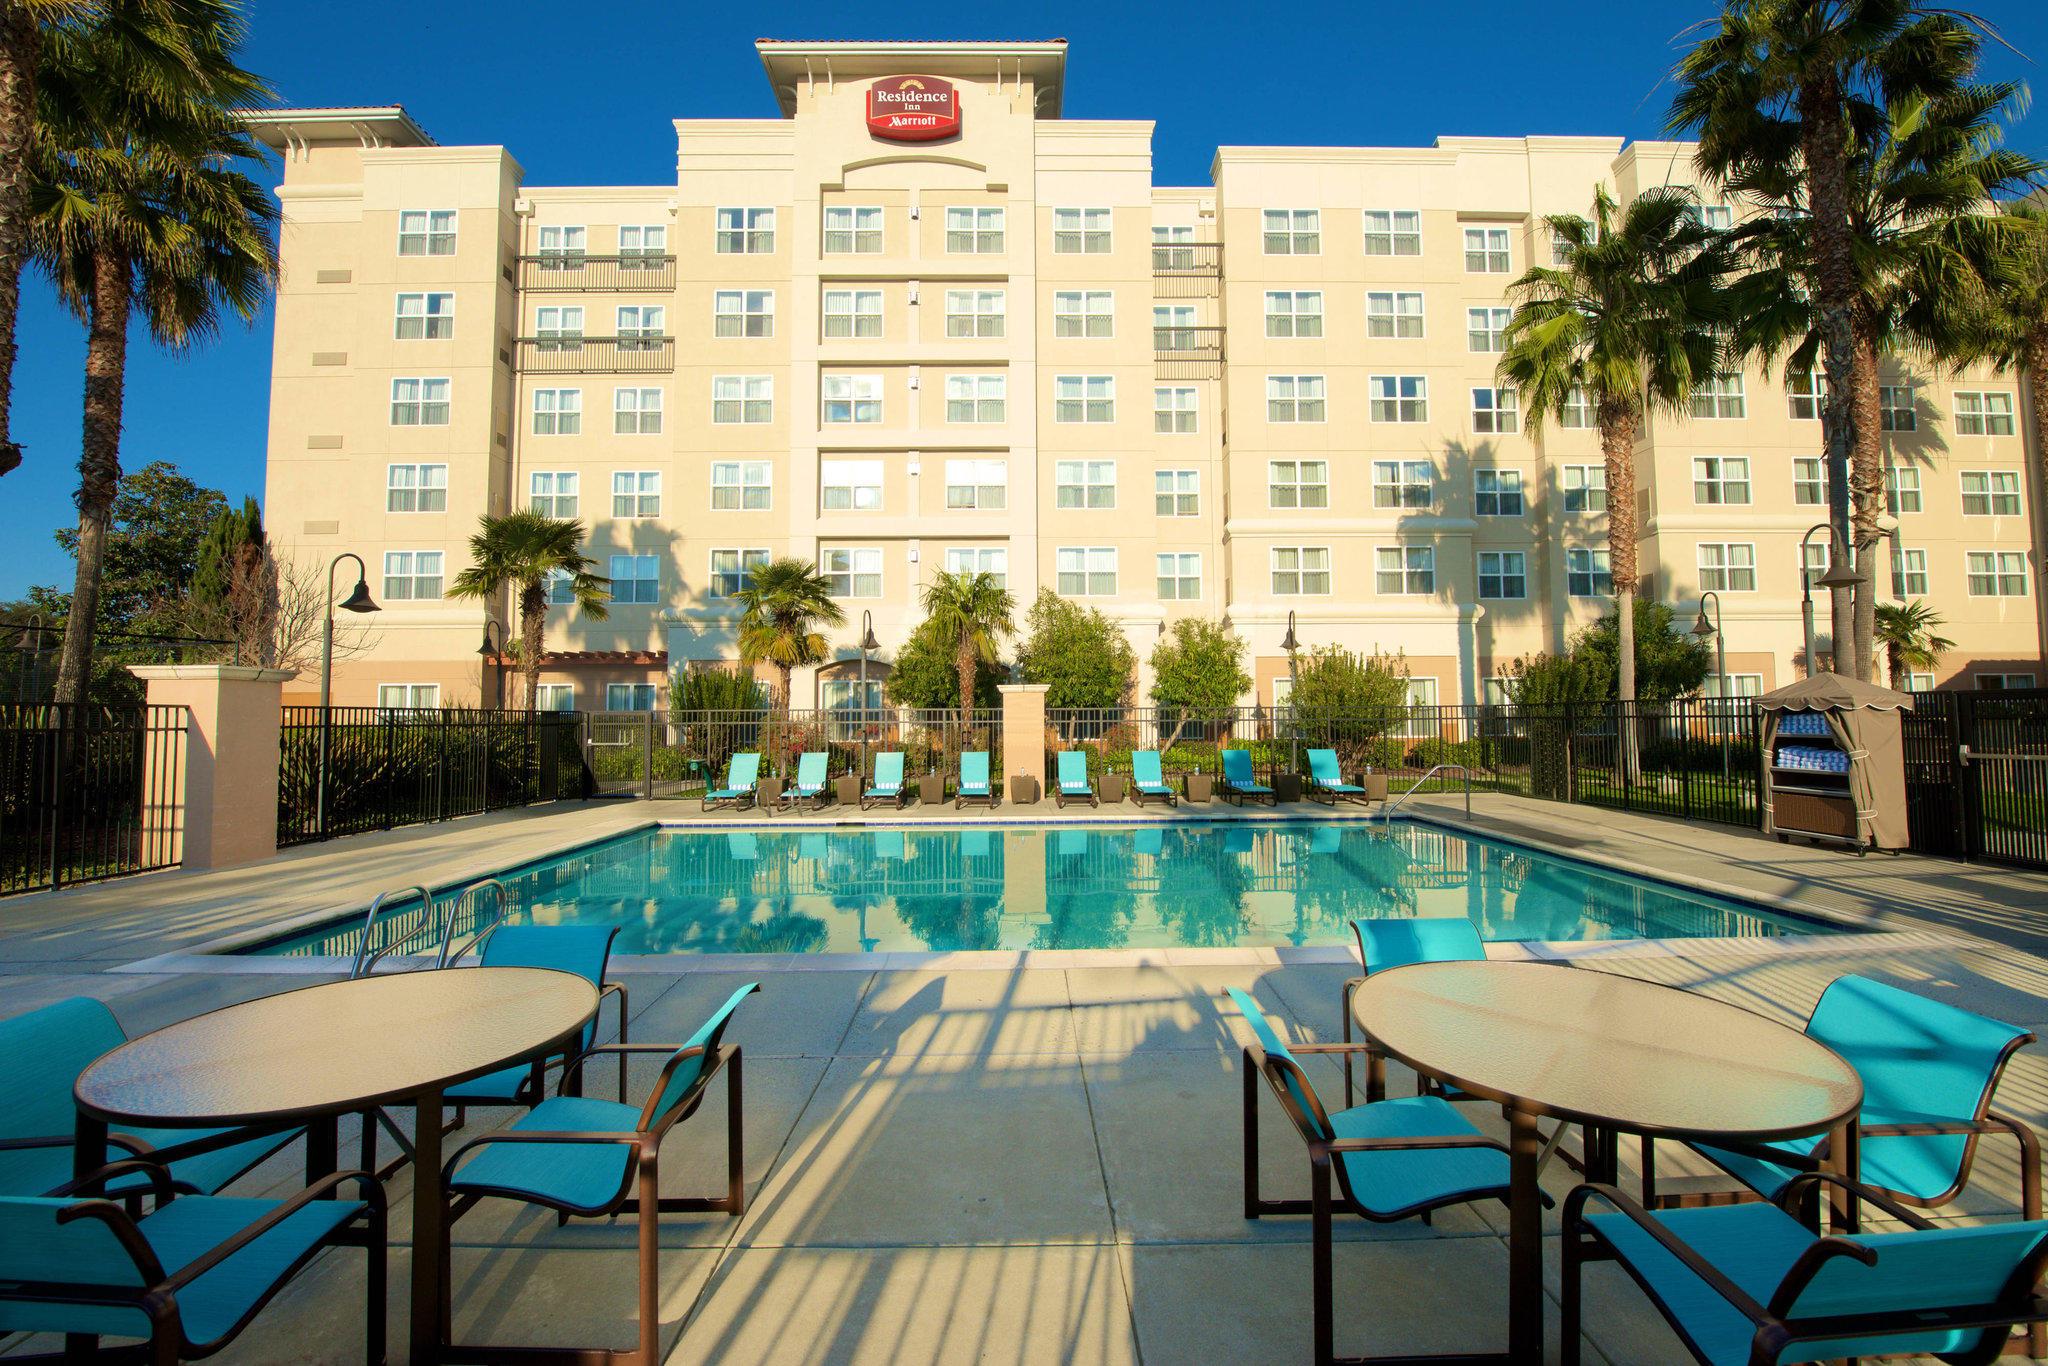 Residence Inn by Marriott Newark Silicon Valley